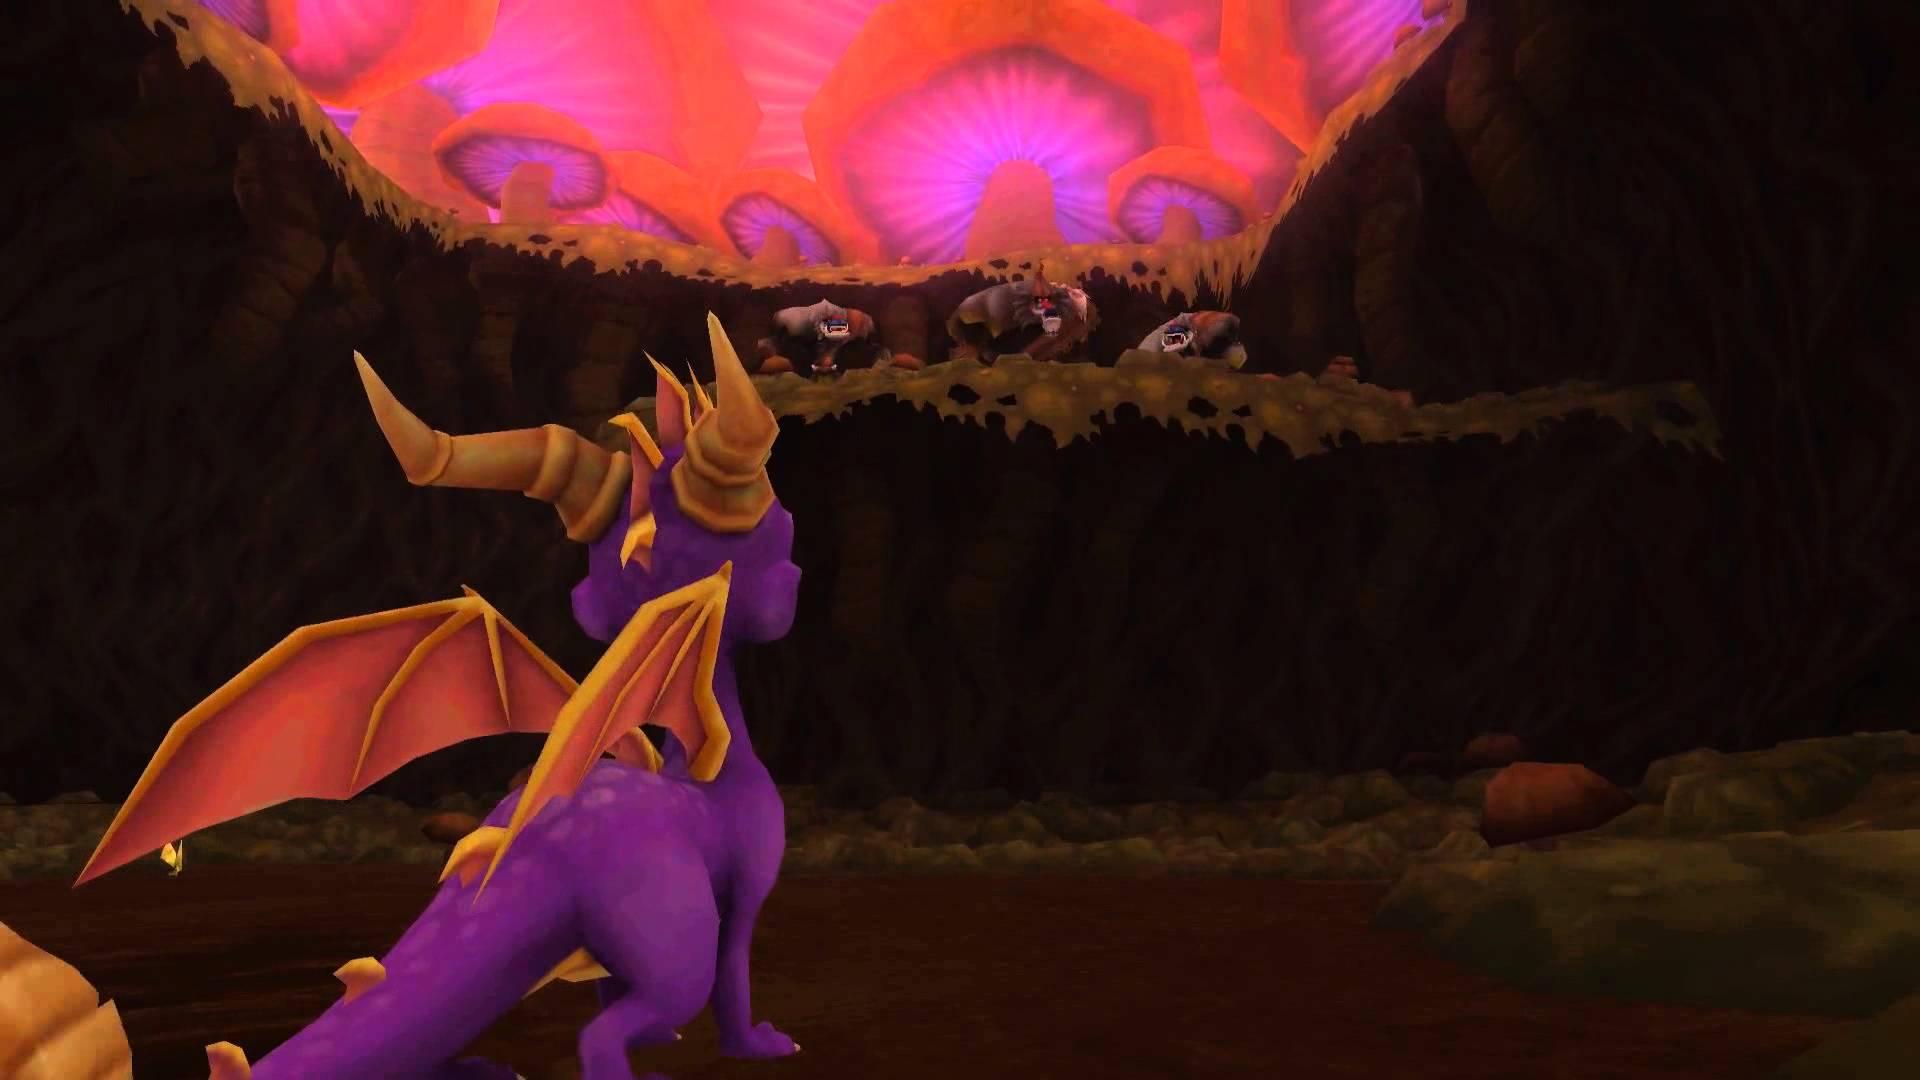 The Legend Of Spyro A New Beginning Press Kit